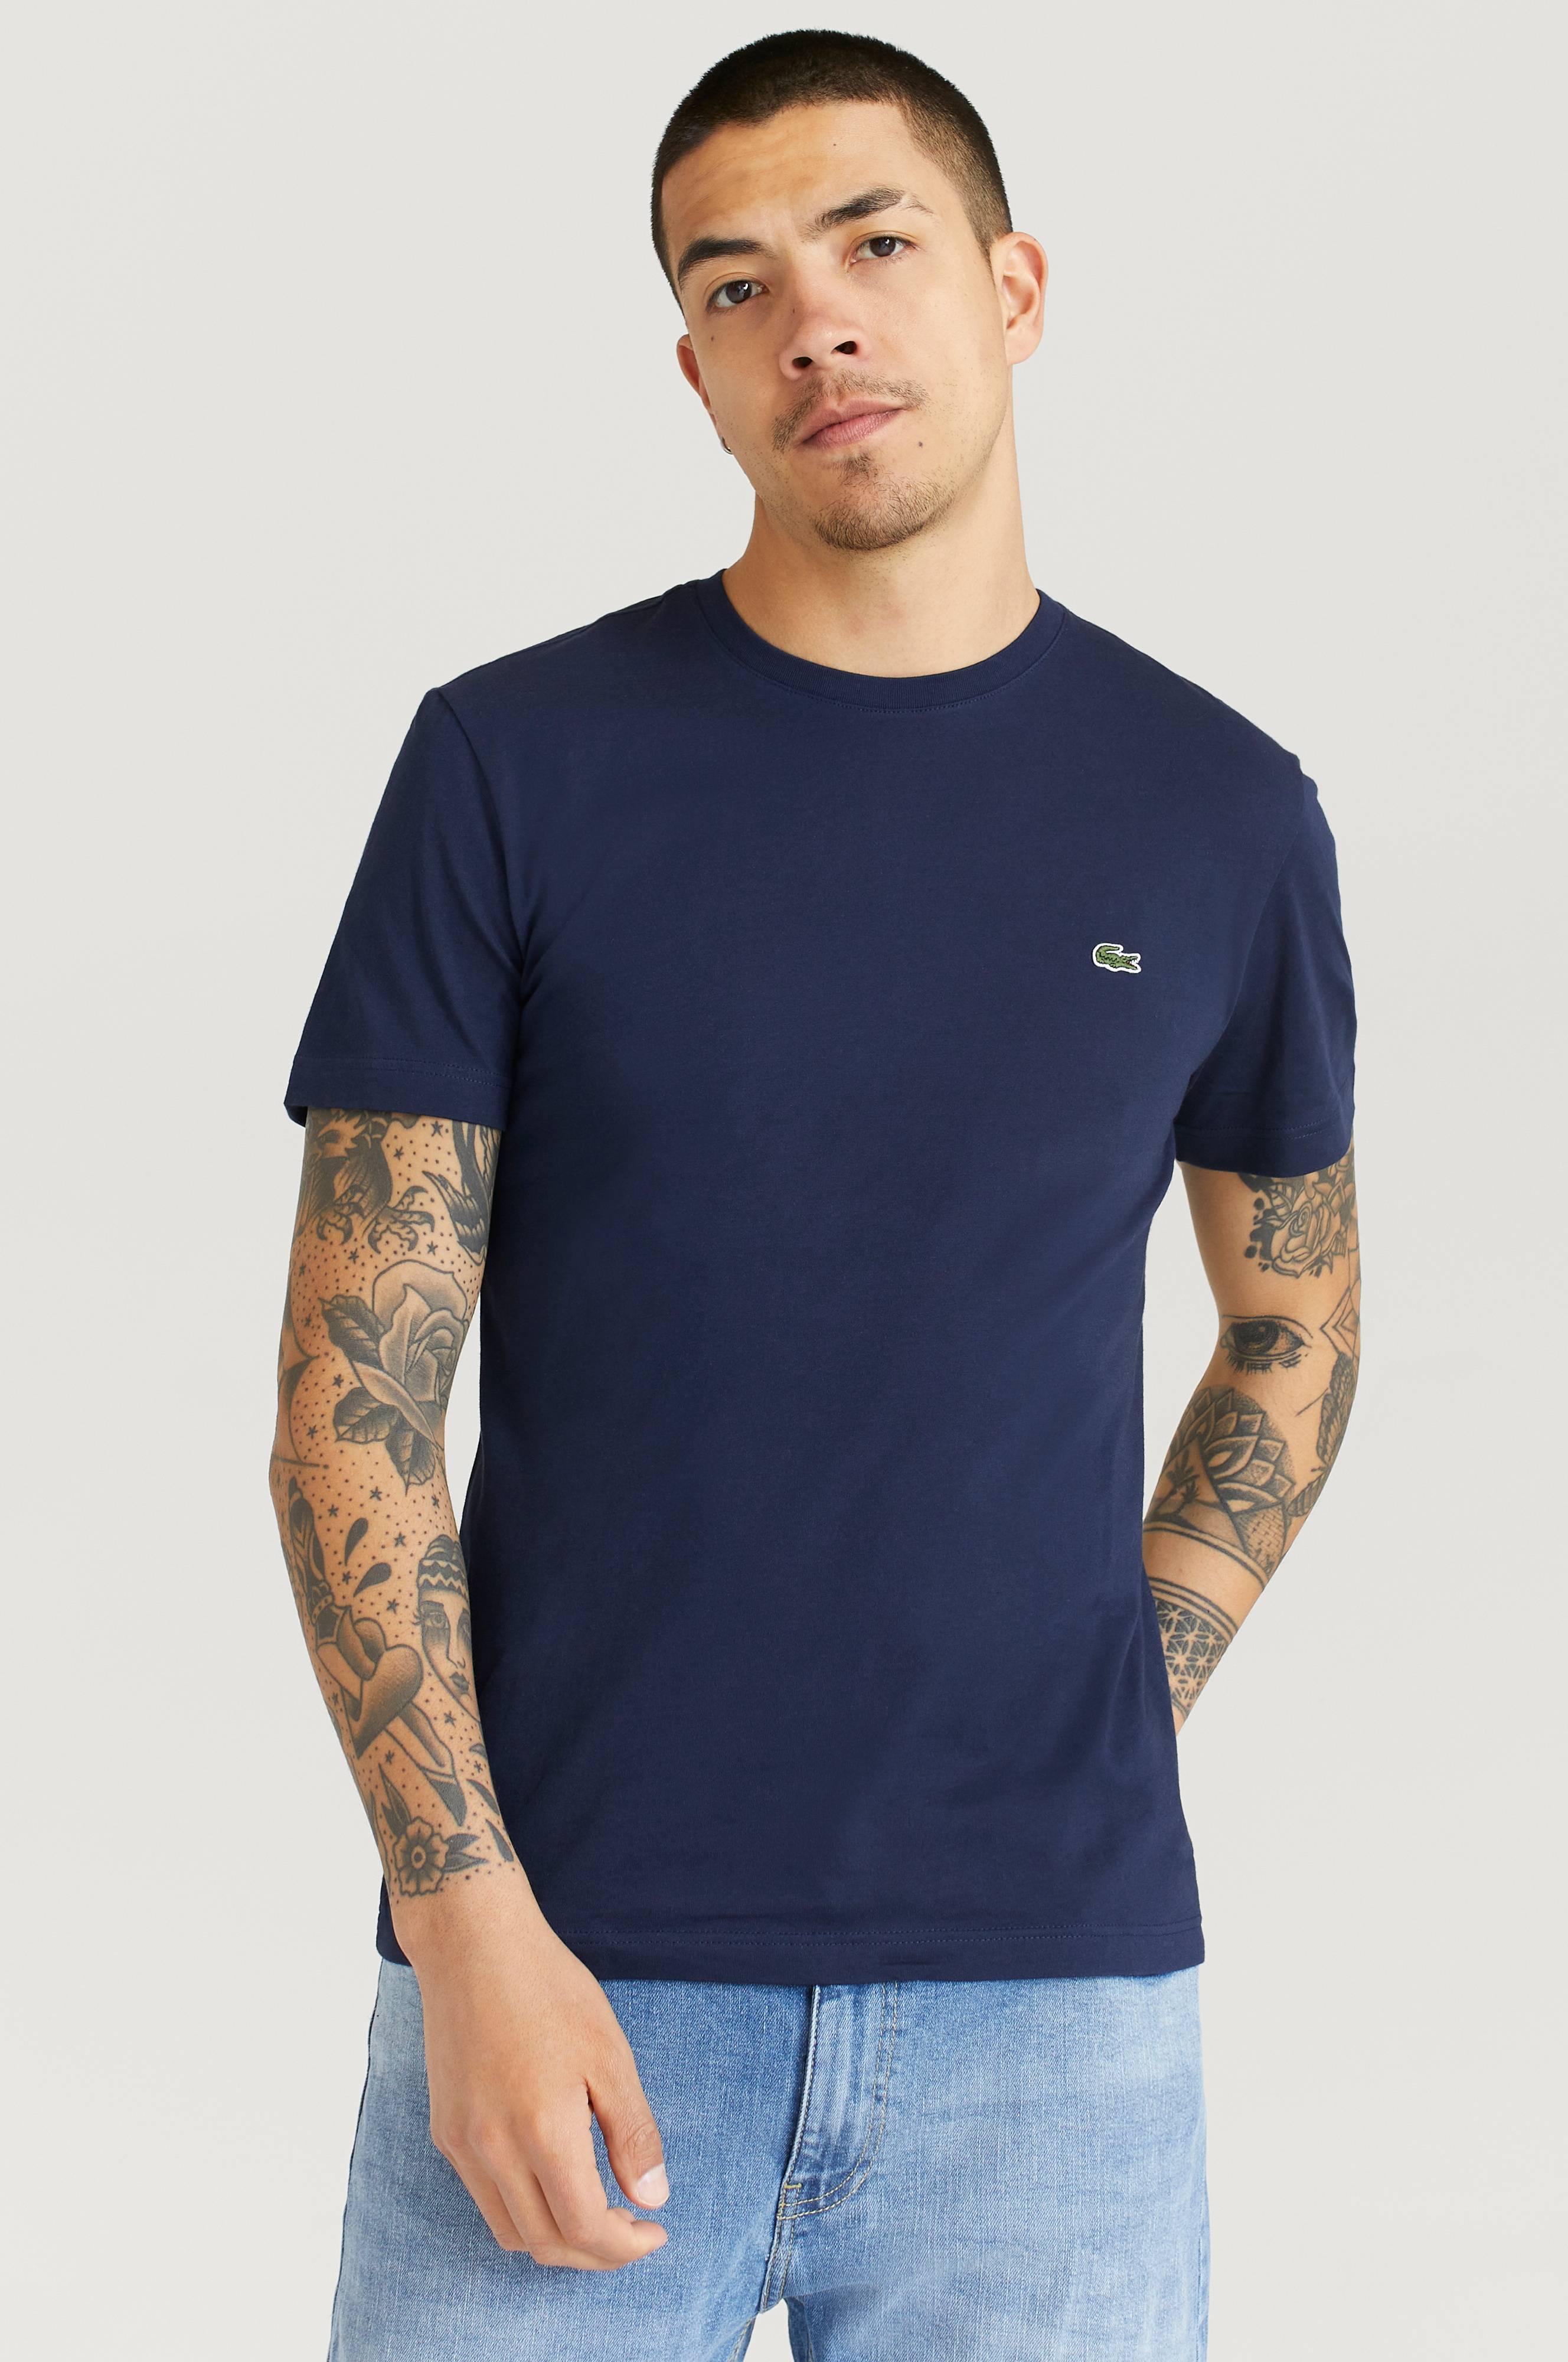 Lacoste T-Shirt Ras Du Cou Manc T-shirts & linnen Navy